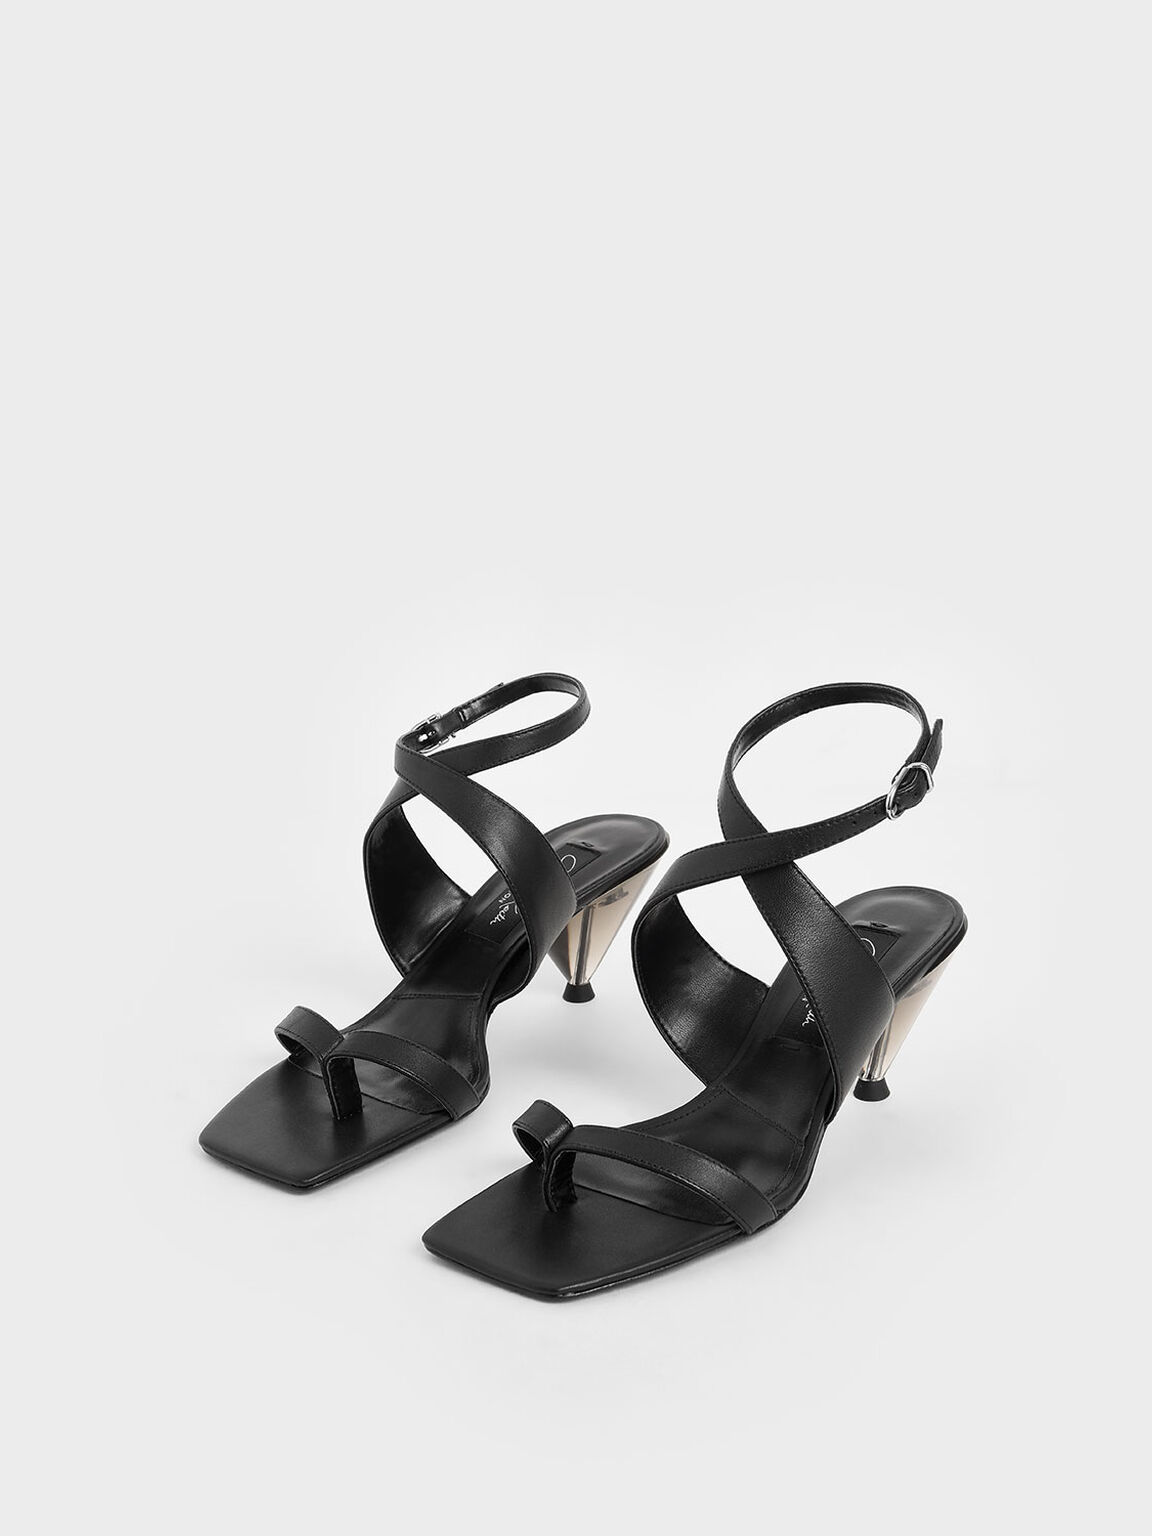 Leather Cone Heel Sandals, Black, hi-res